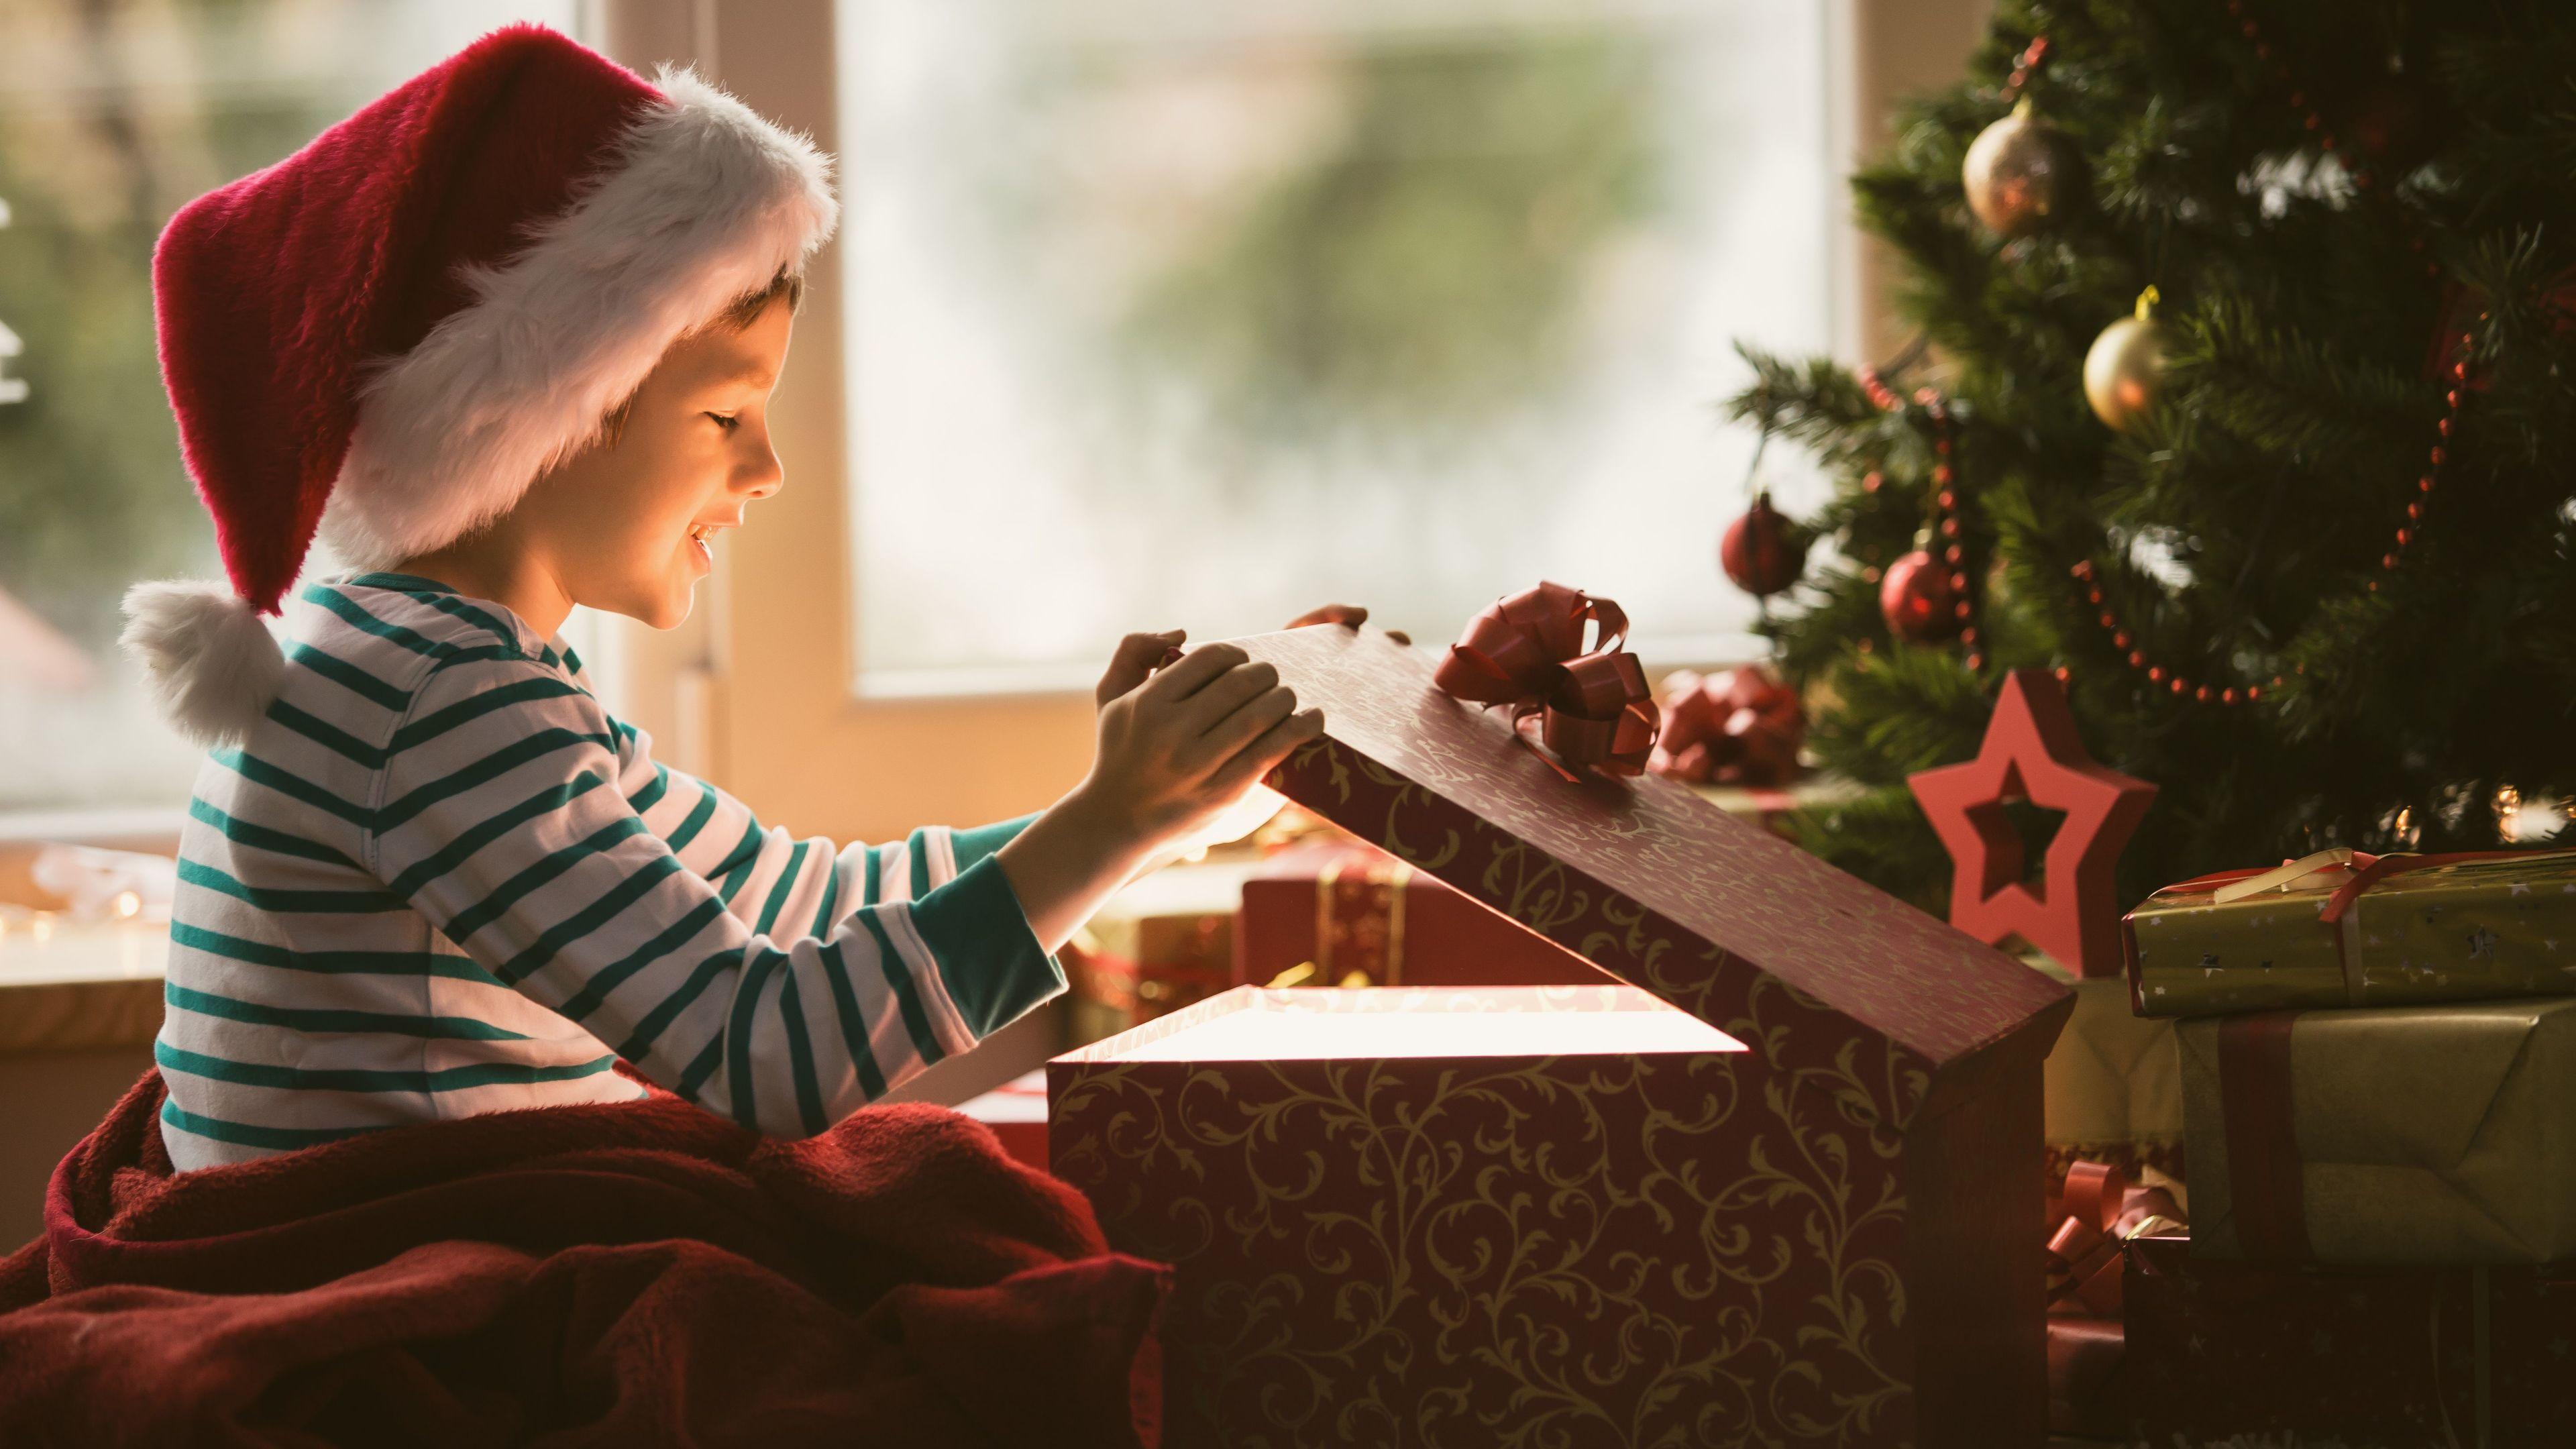 boy opening christmas present 4k 1543946583 - Boy Opening Christmas Present 4k - hd-wallpapers, gift wallpapers, christmas wallpapers, celebrations wallpapers, 5k wallpapers, 4k-wallpapers